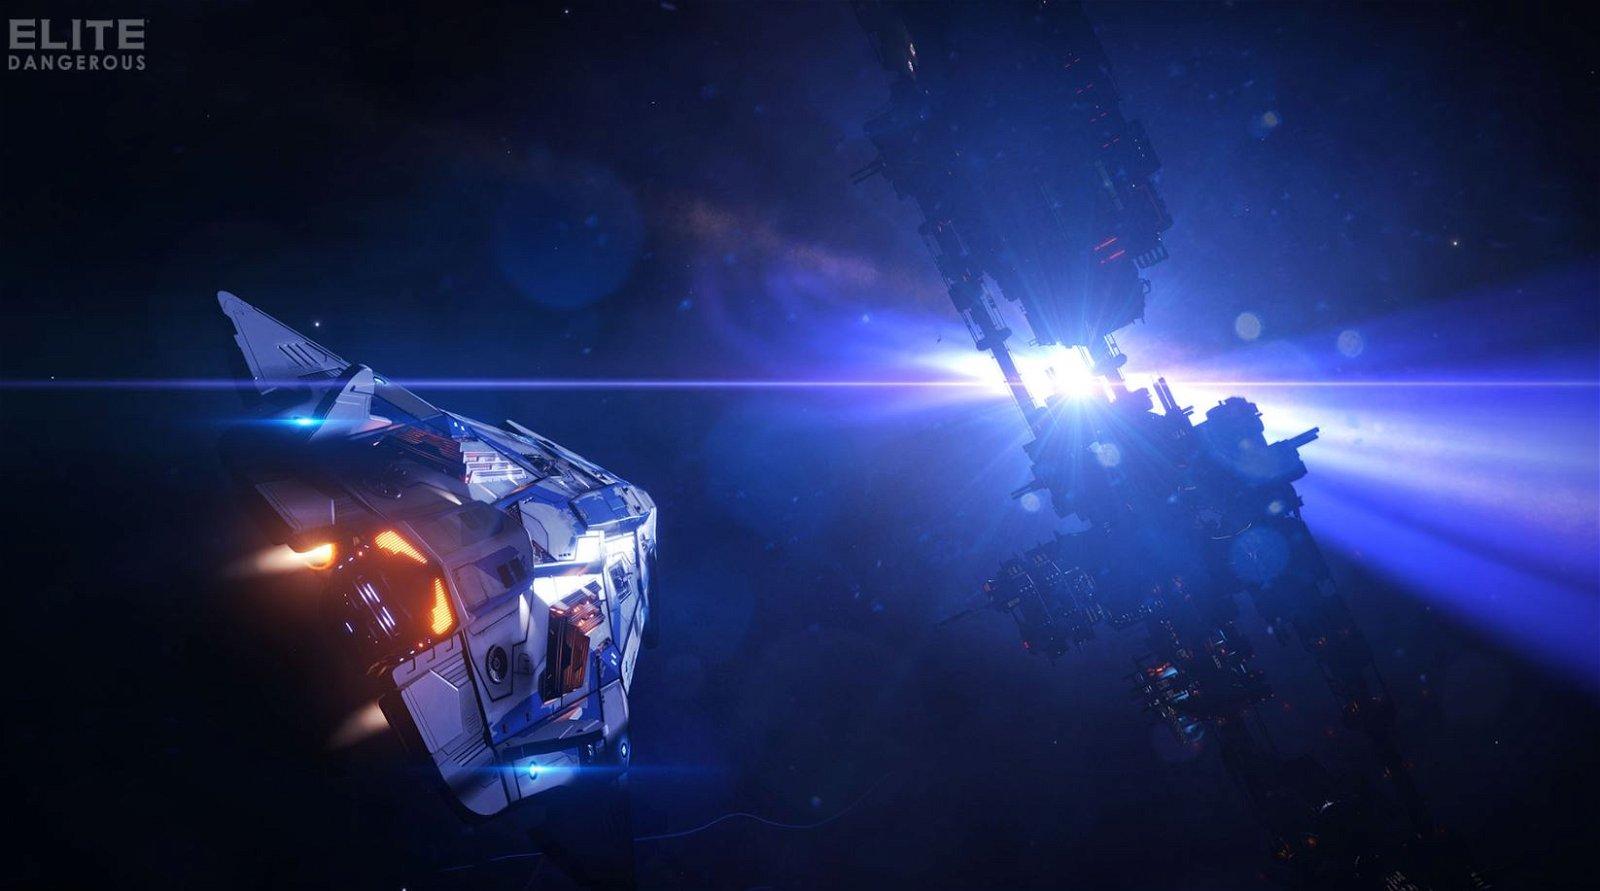 Elite Dangerous: Odyssey Update 7.01